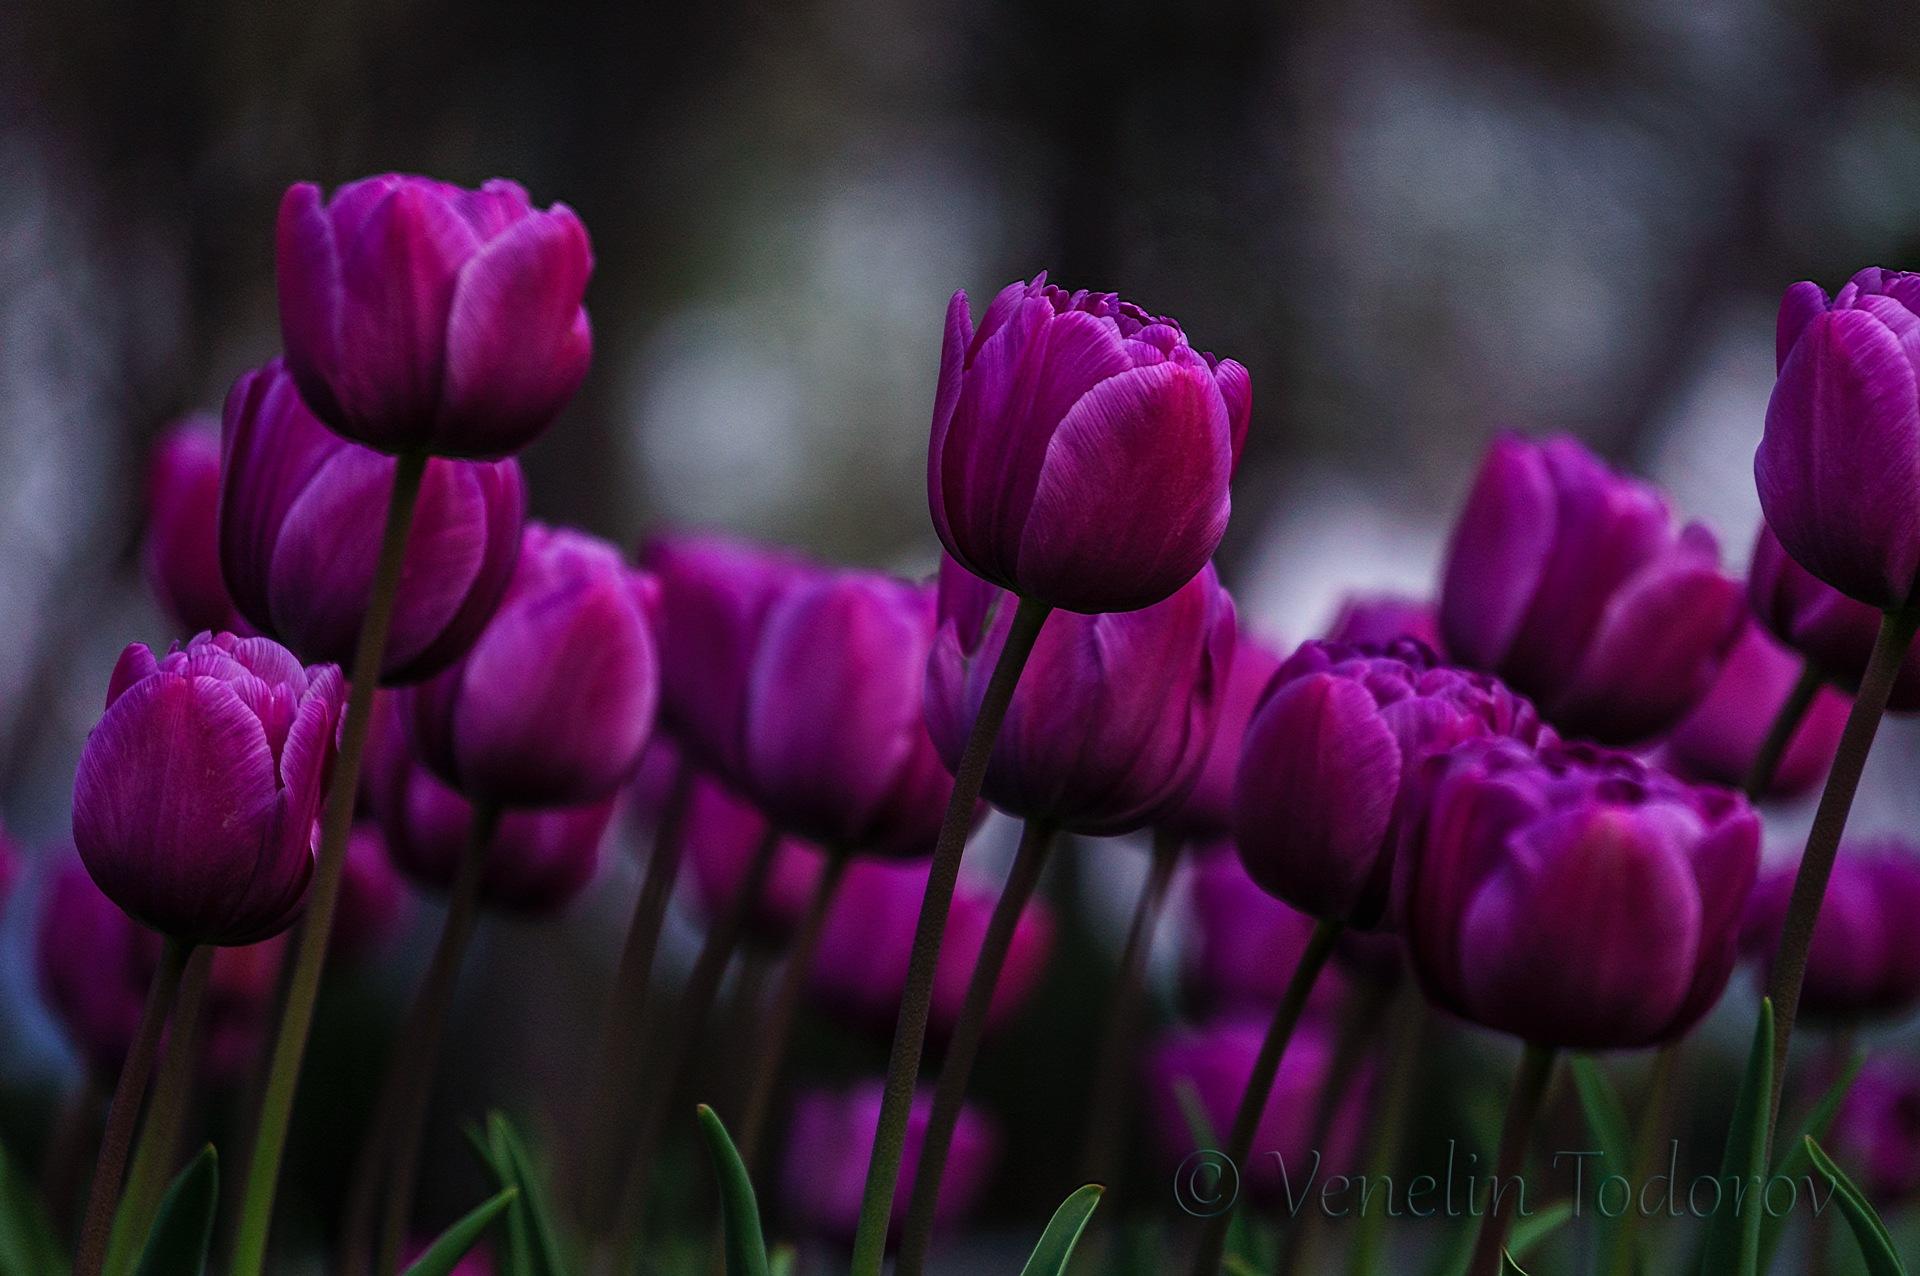 Purple beauty  by Venelin Todorov